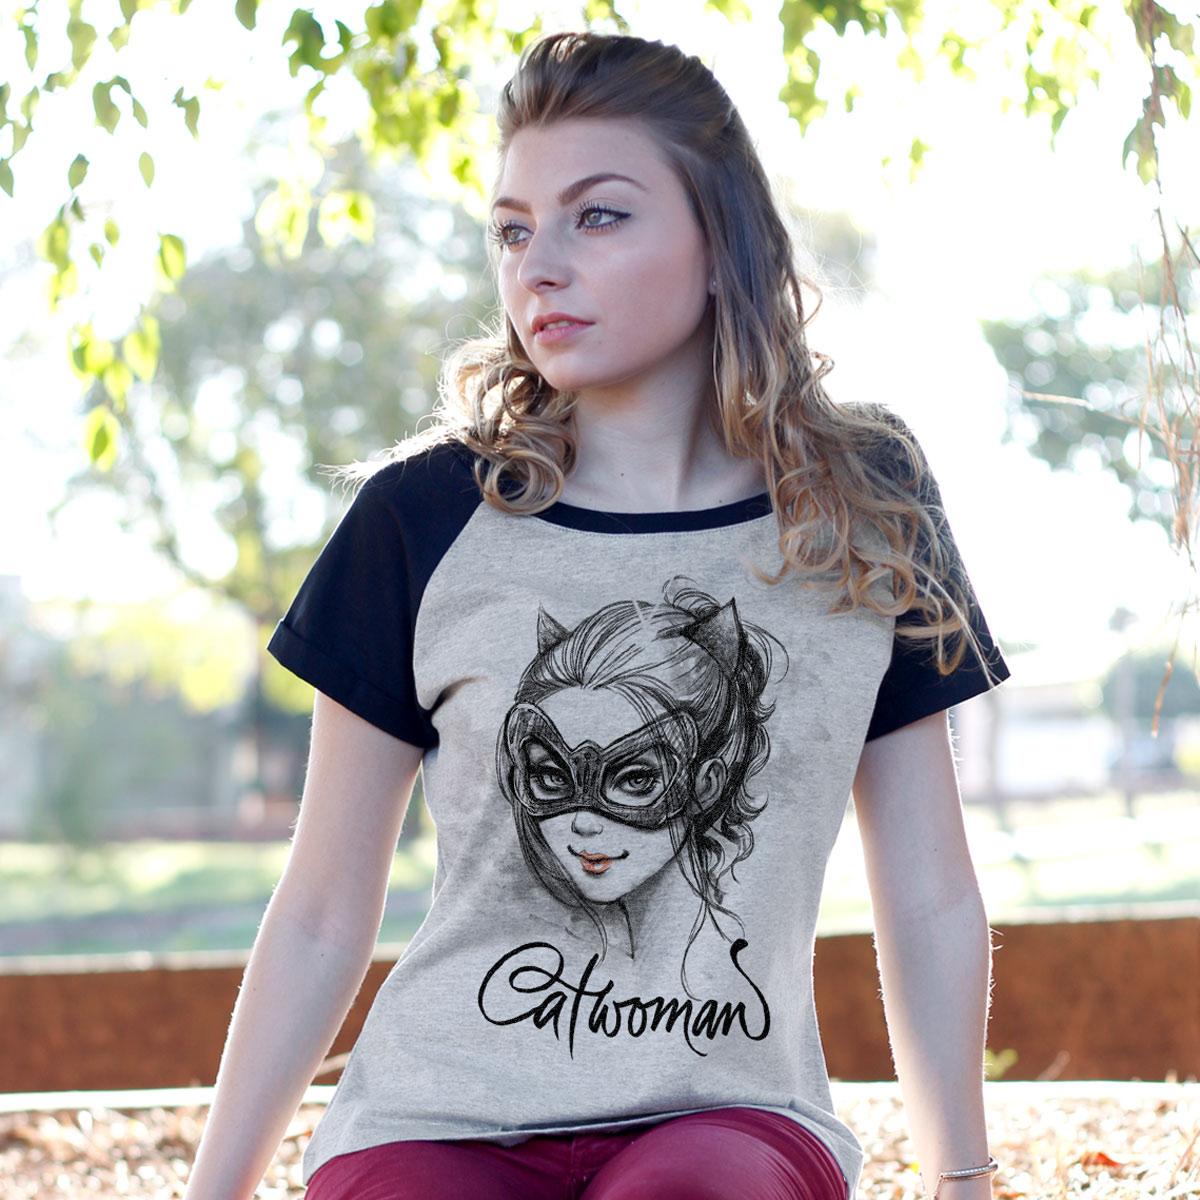 Camiseta Raglan Feminina Catwoman Selina Kyle